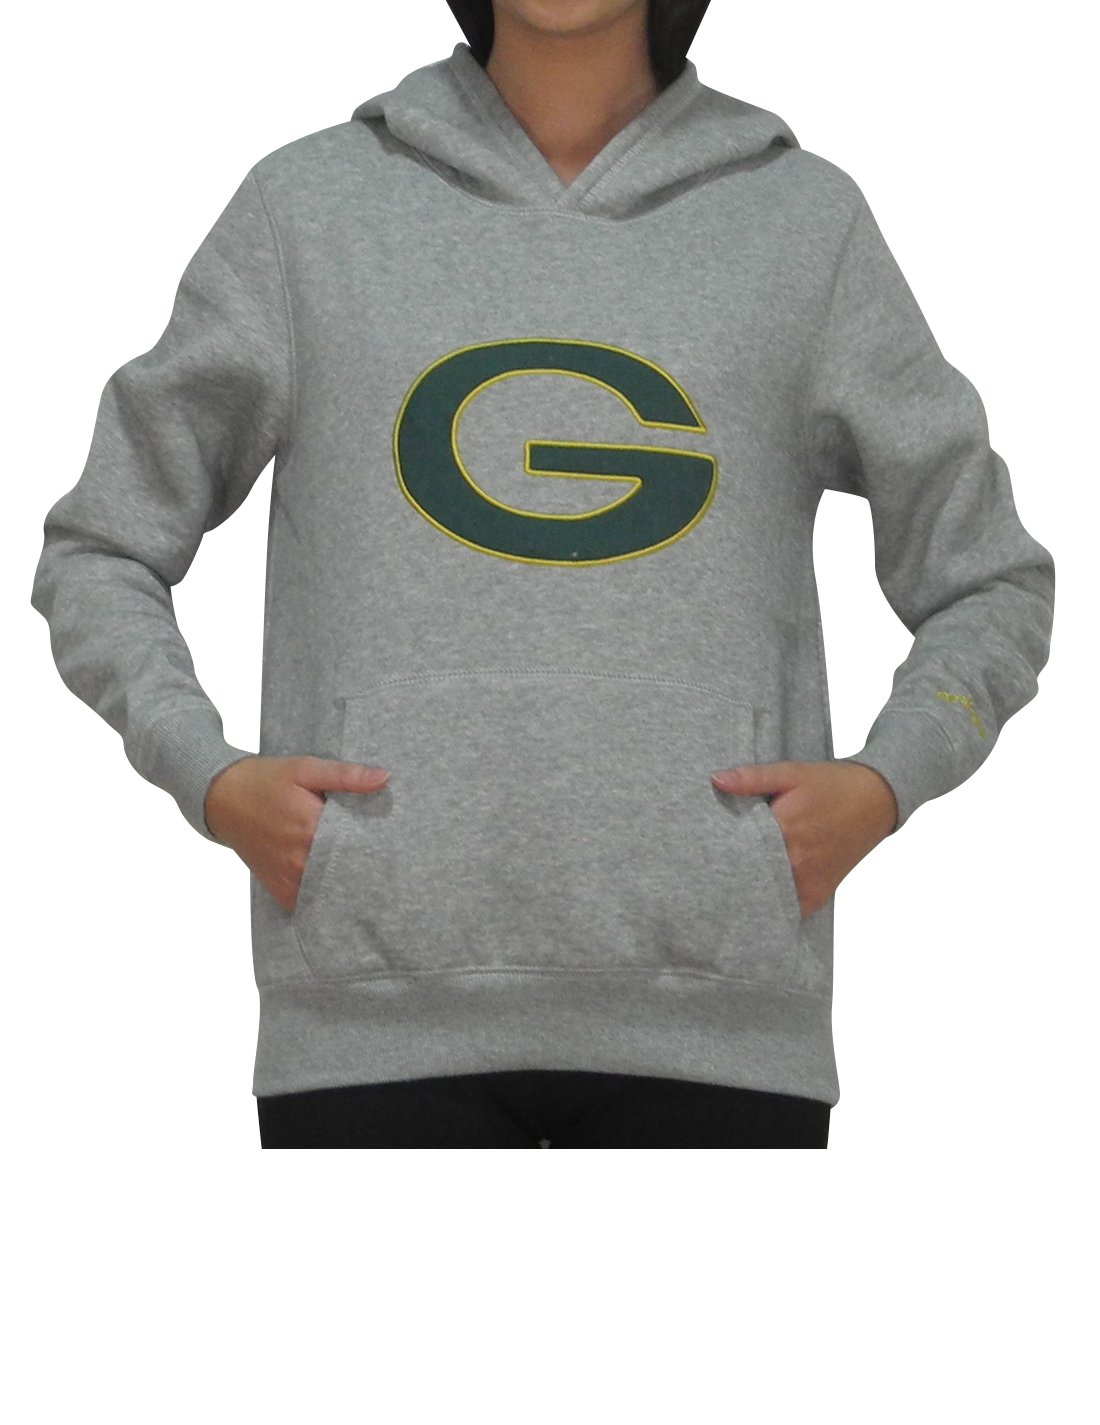 Pink Victoria's Secret GB Packers Womens Athletic Hoodie L Grey